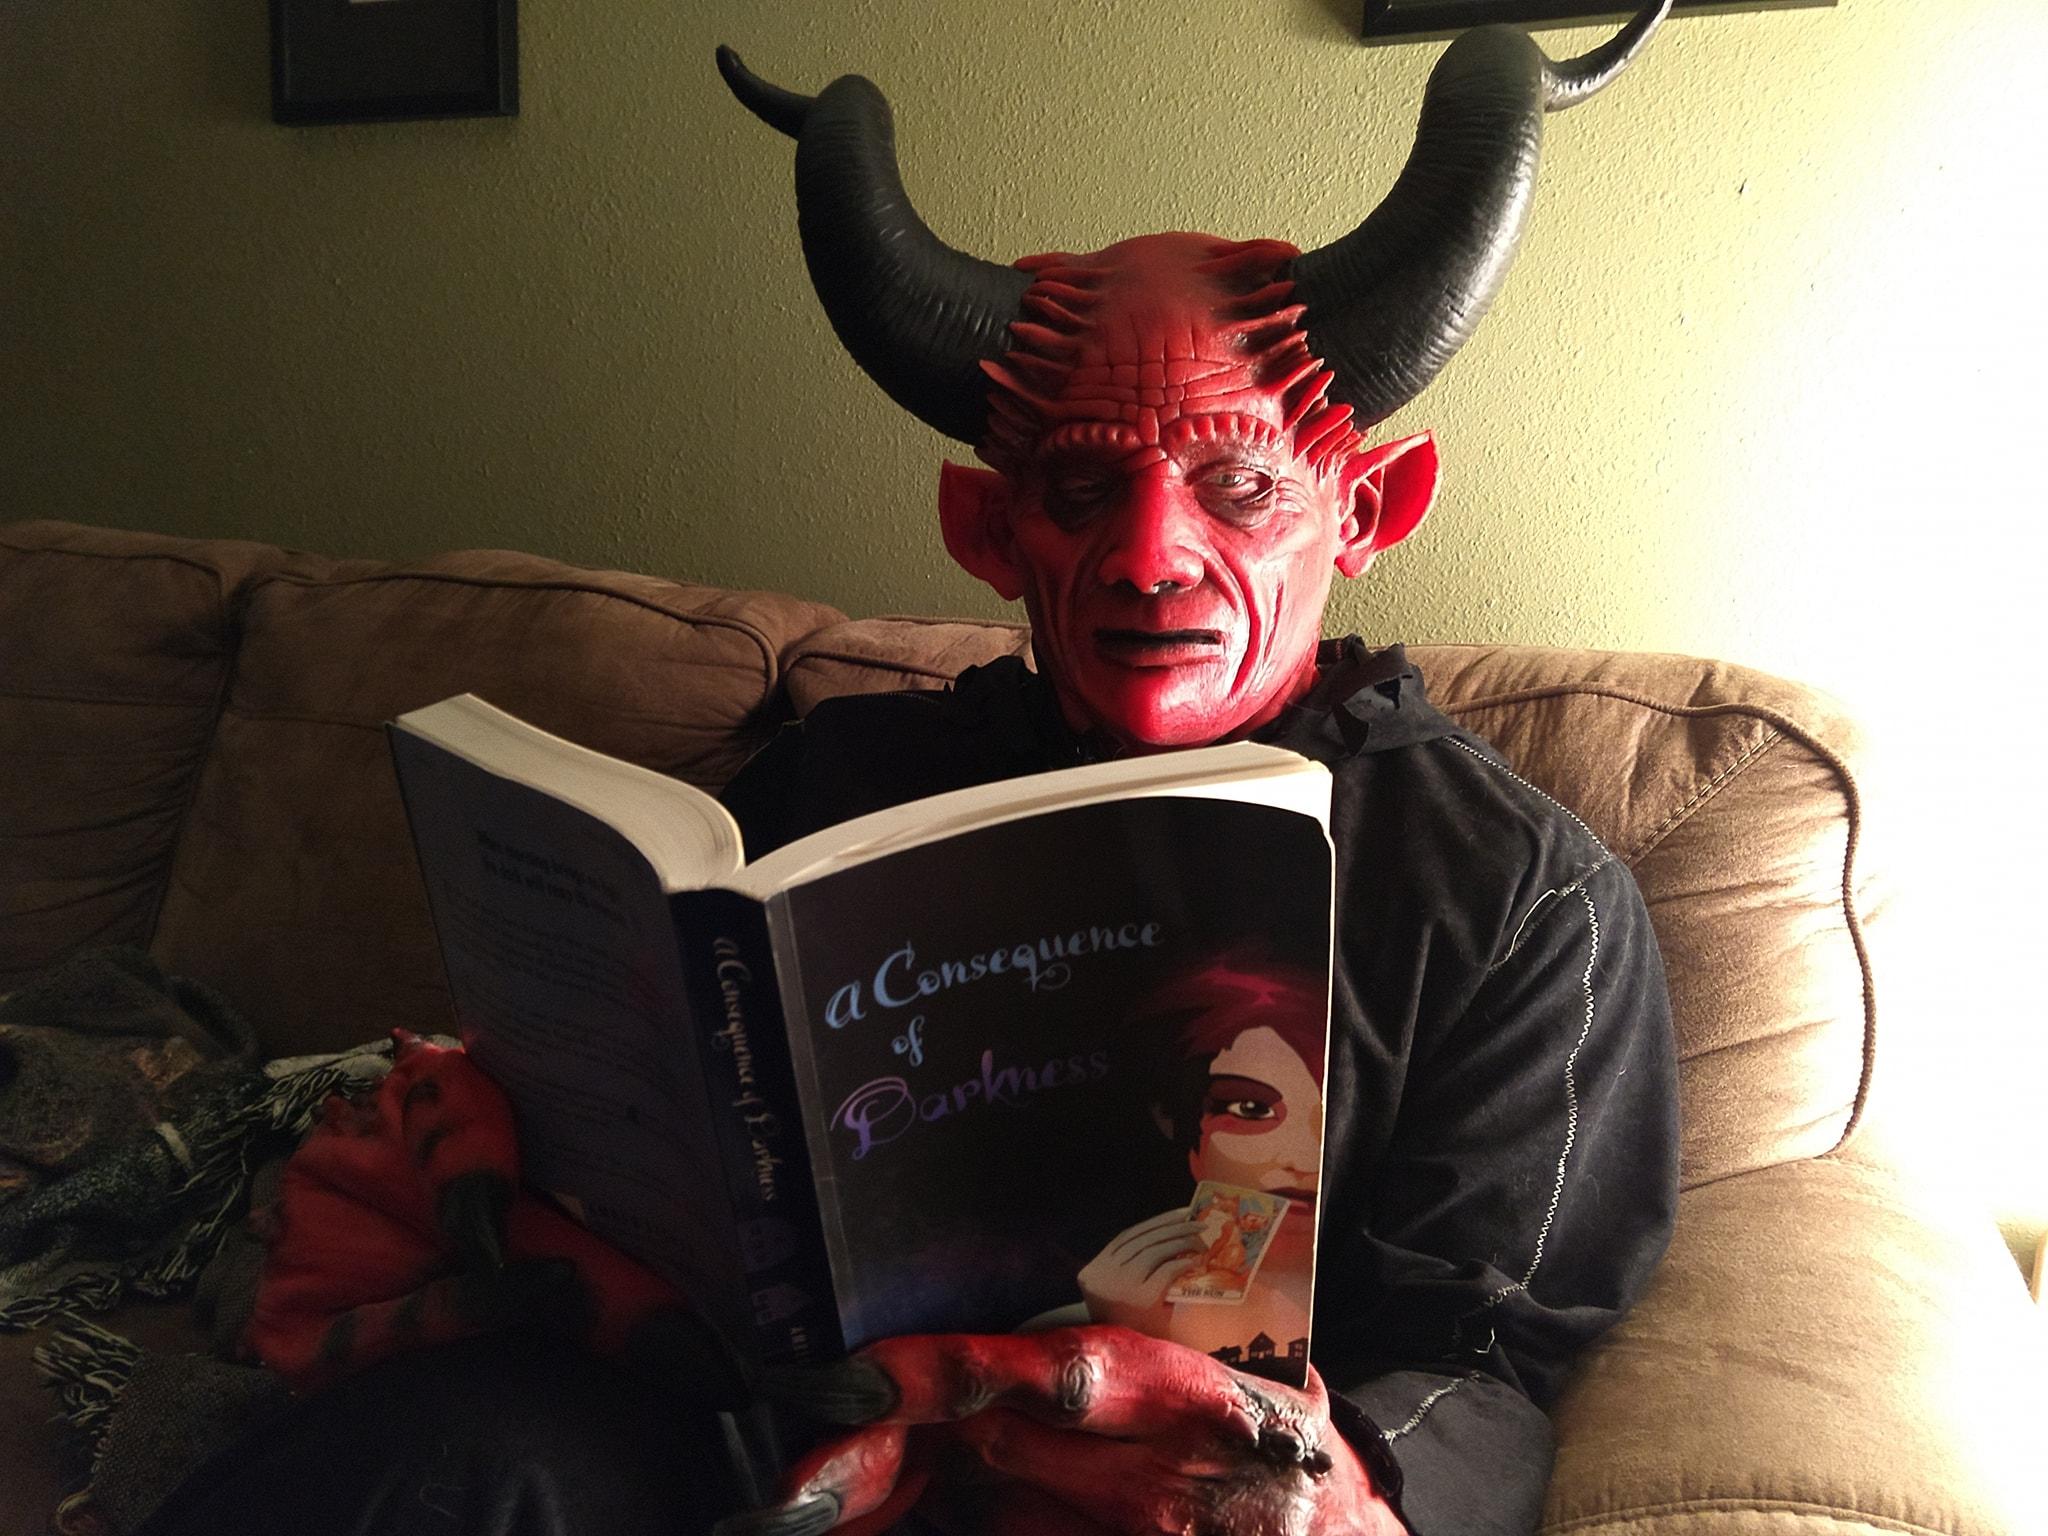 Demon reading a book